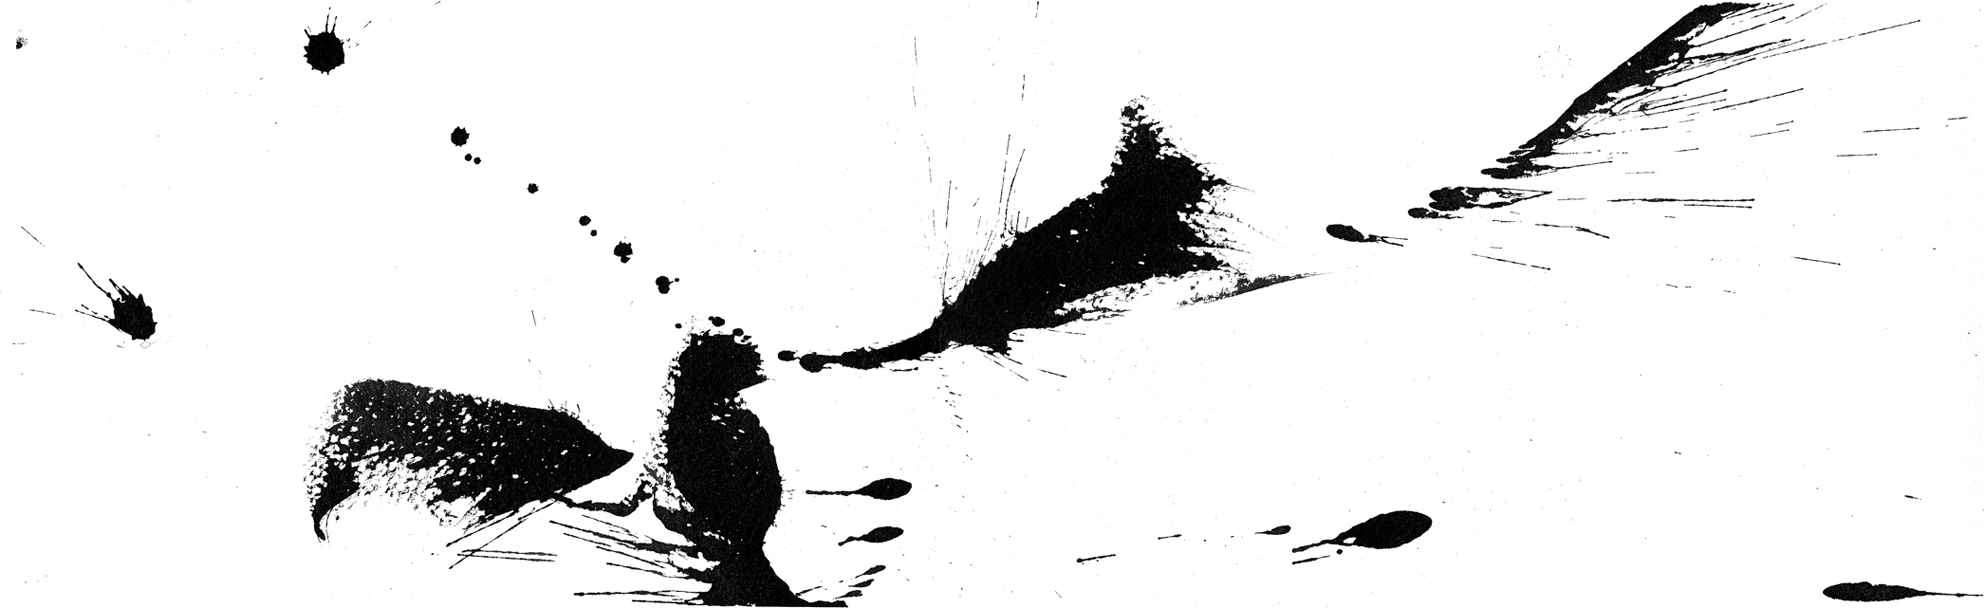 La main de neige - 3